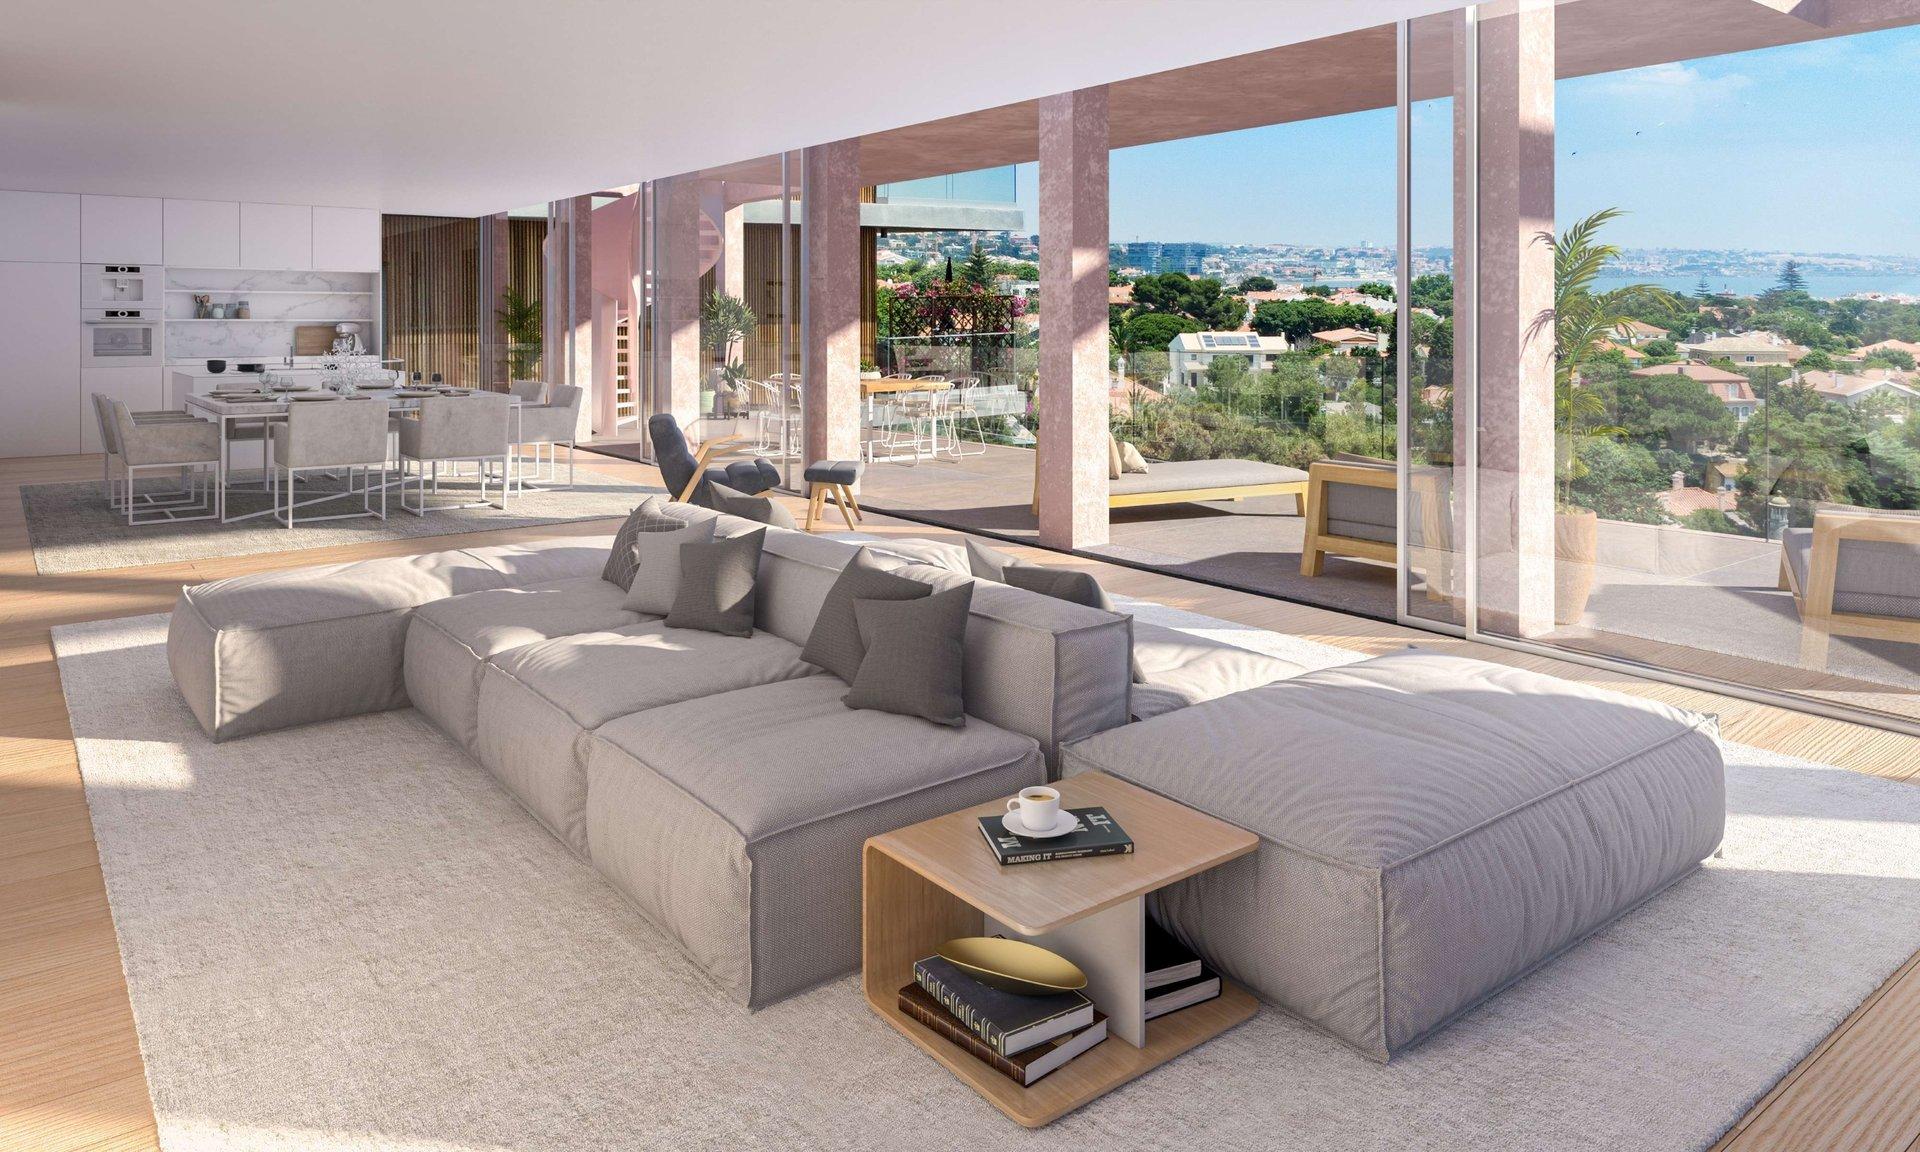 3 Bedroom Apartment Cascais, Lisbon Ref: ASA147D